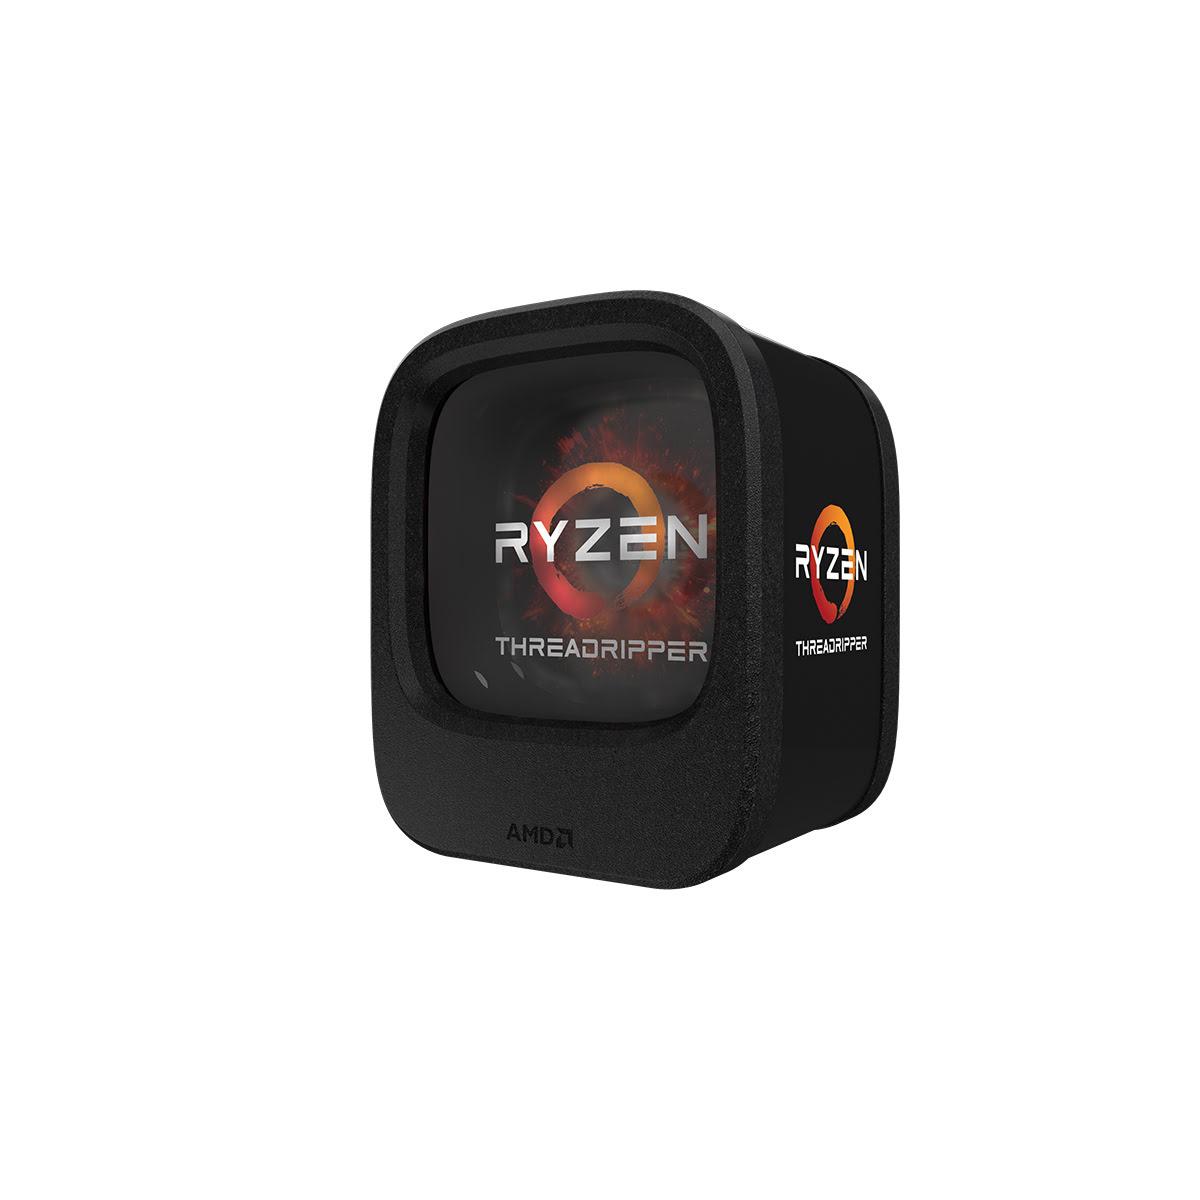 AMD Ryzen Threadripper 1950X - 3.4 - 4GHz - Processeur AMD - 0